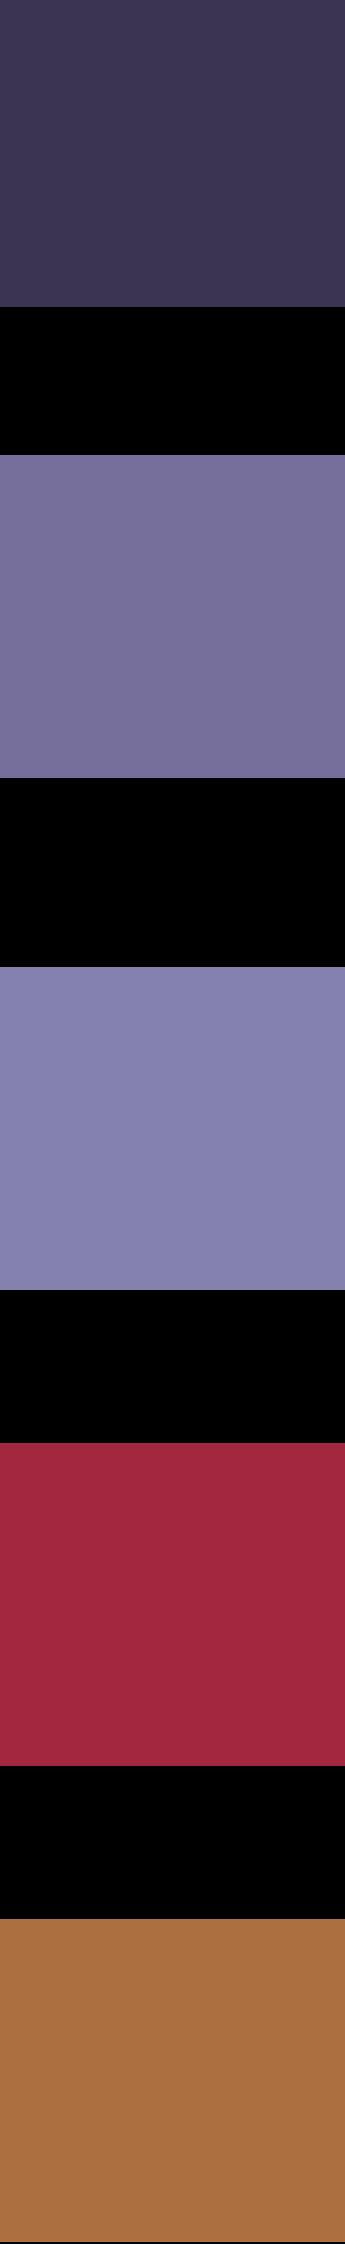 2020-pix-114-2